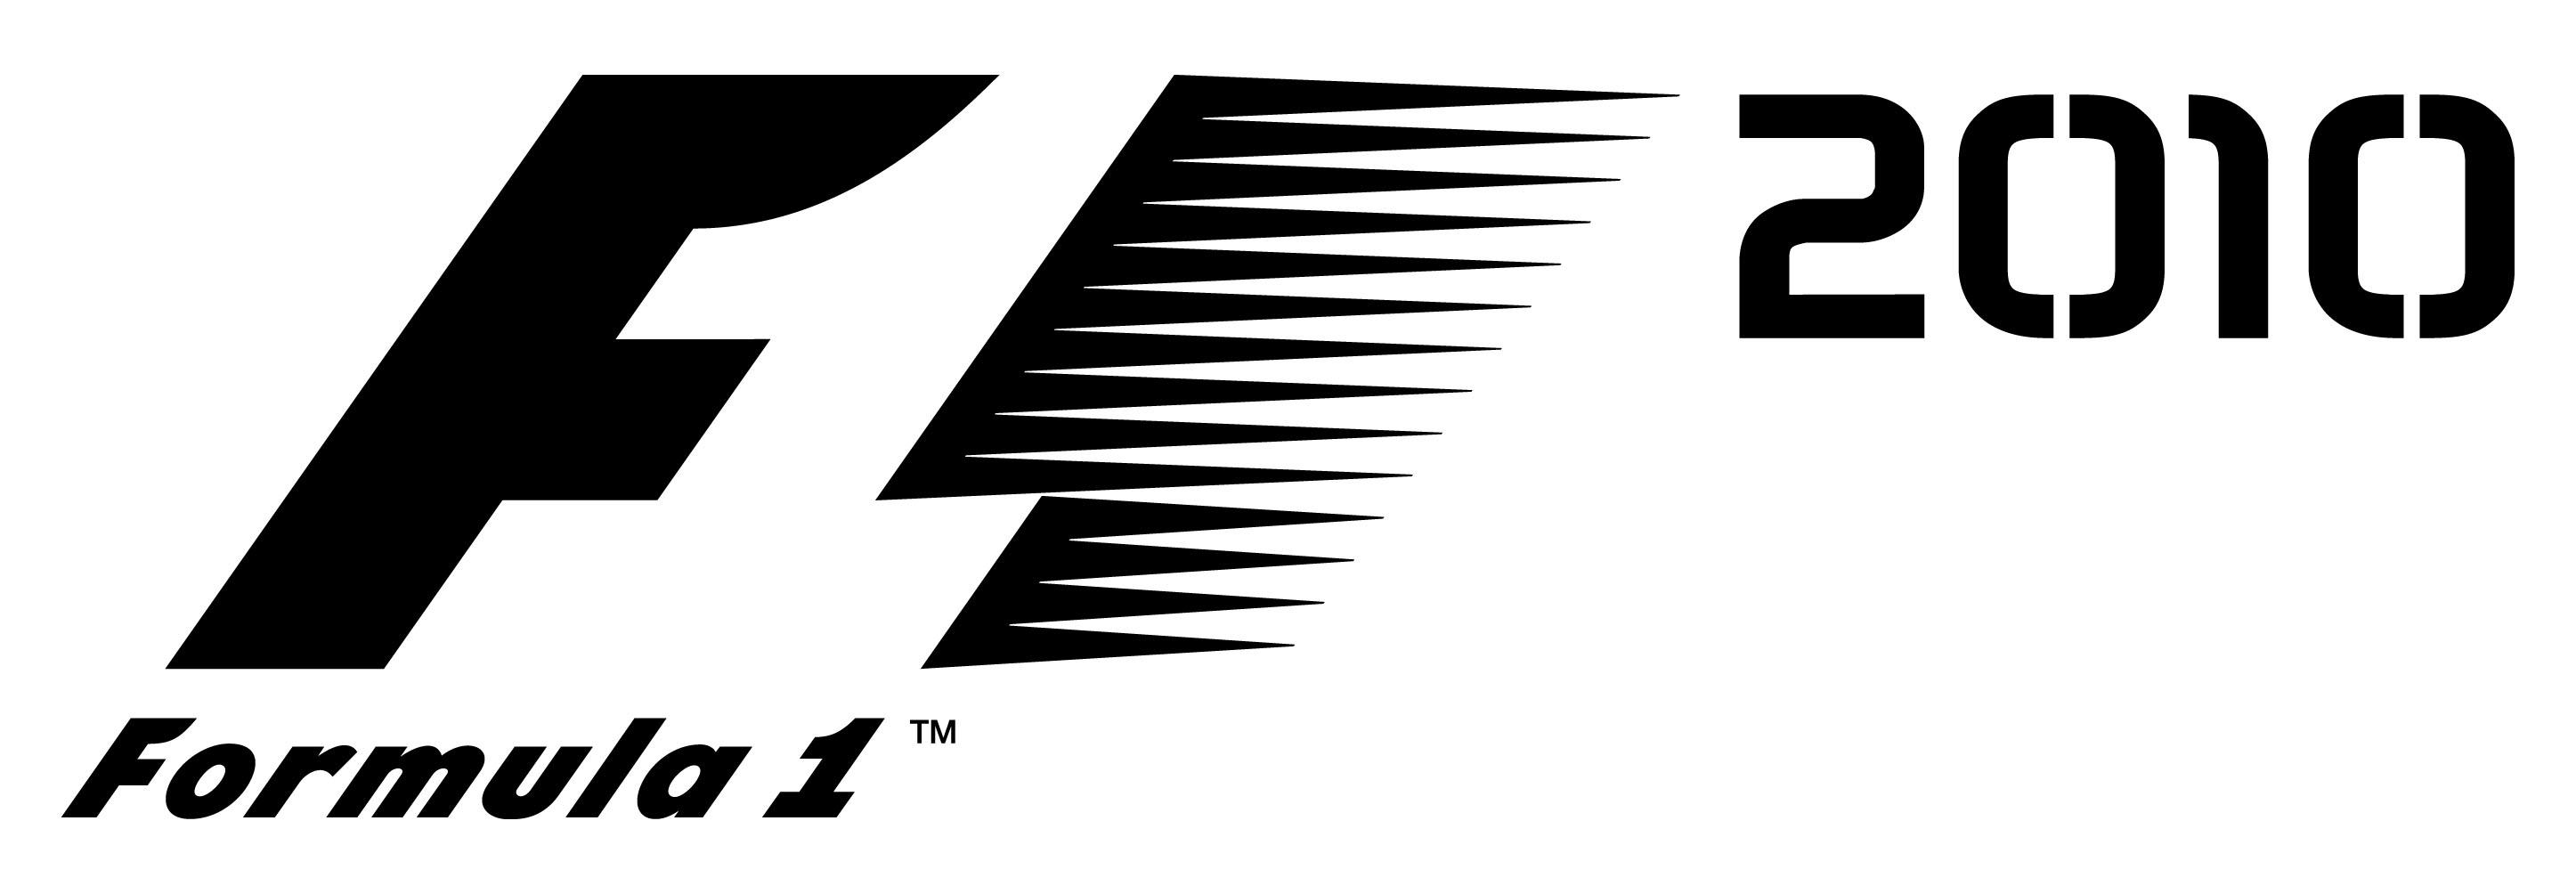 Formula 1 Logo 2